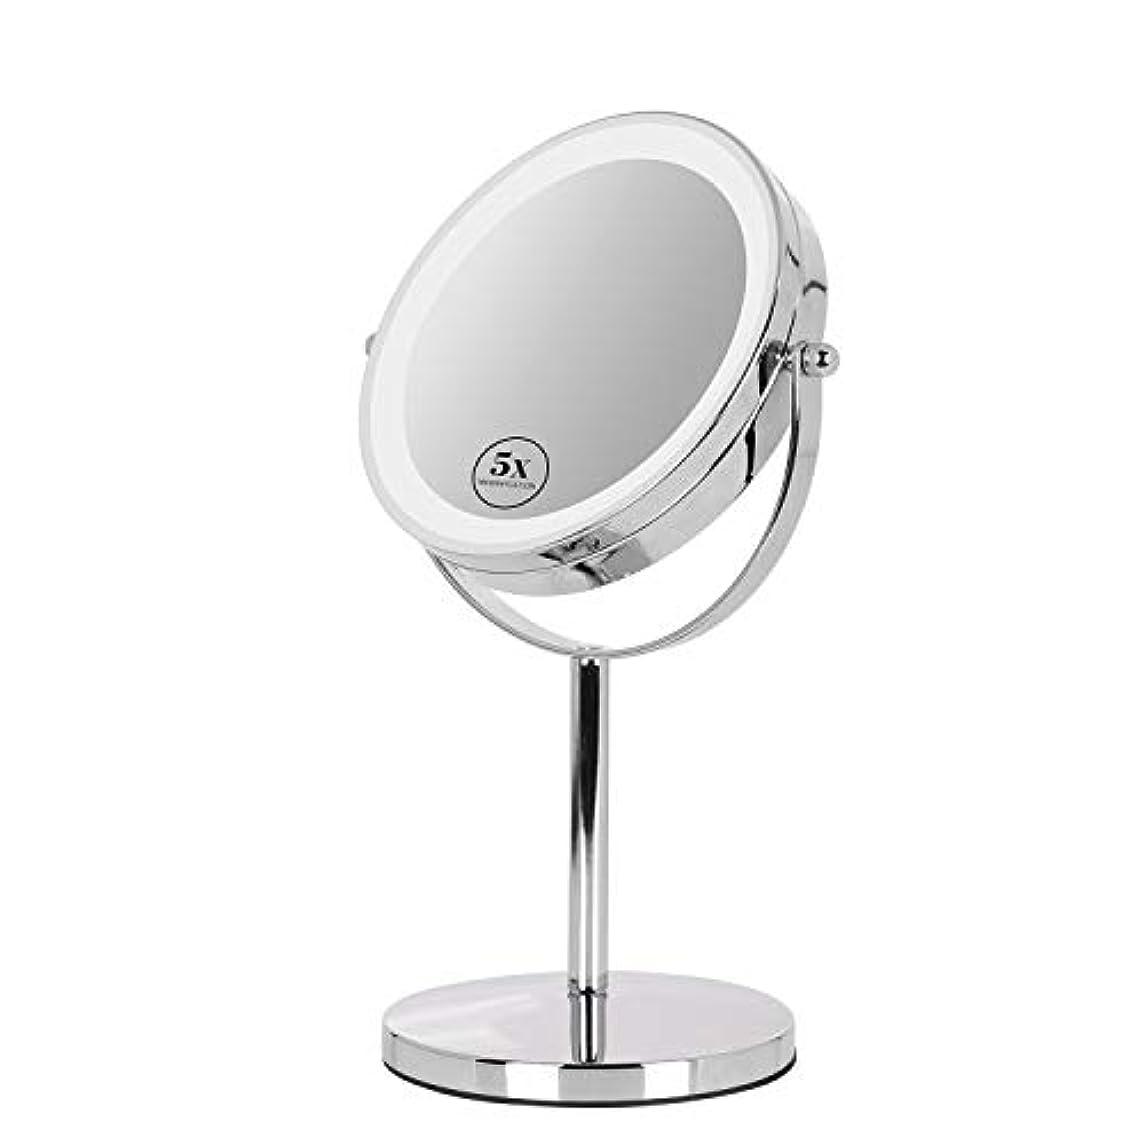 暗殺トロリー飼料卓上ミラー 鏡 化粧鏡 LED付き 真実の両面鏡DX 5倍拡大鏡 360度回転 卓上鏡 鏡面Φ165mm